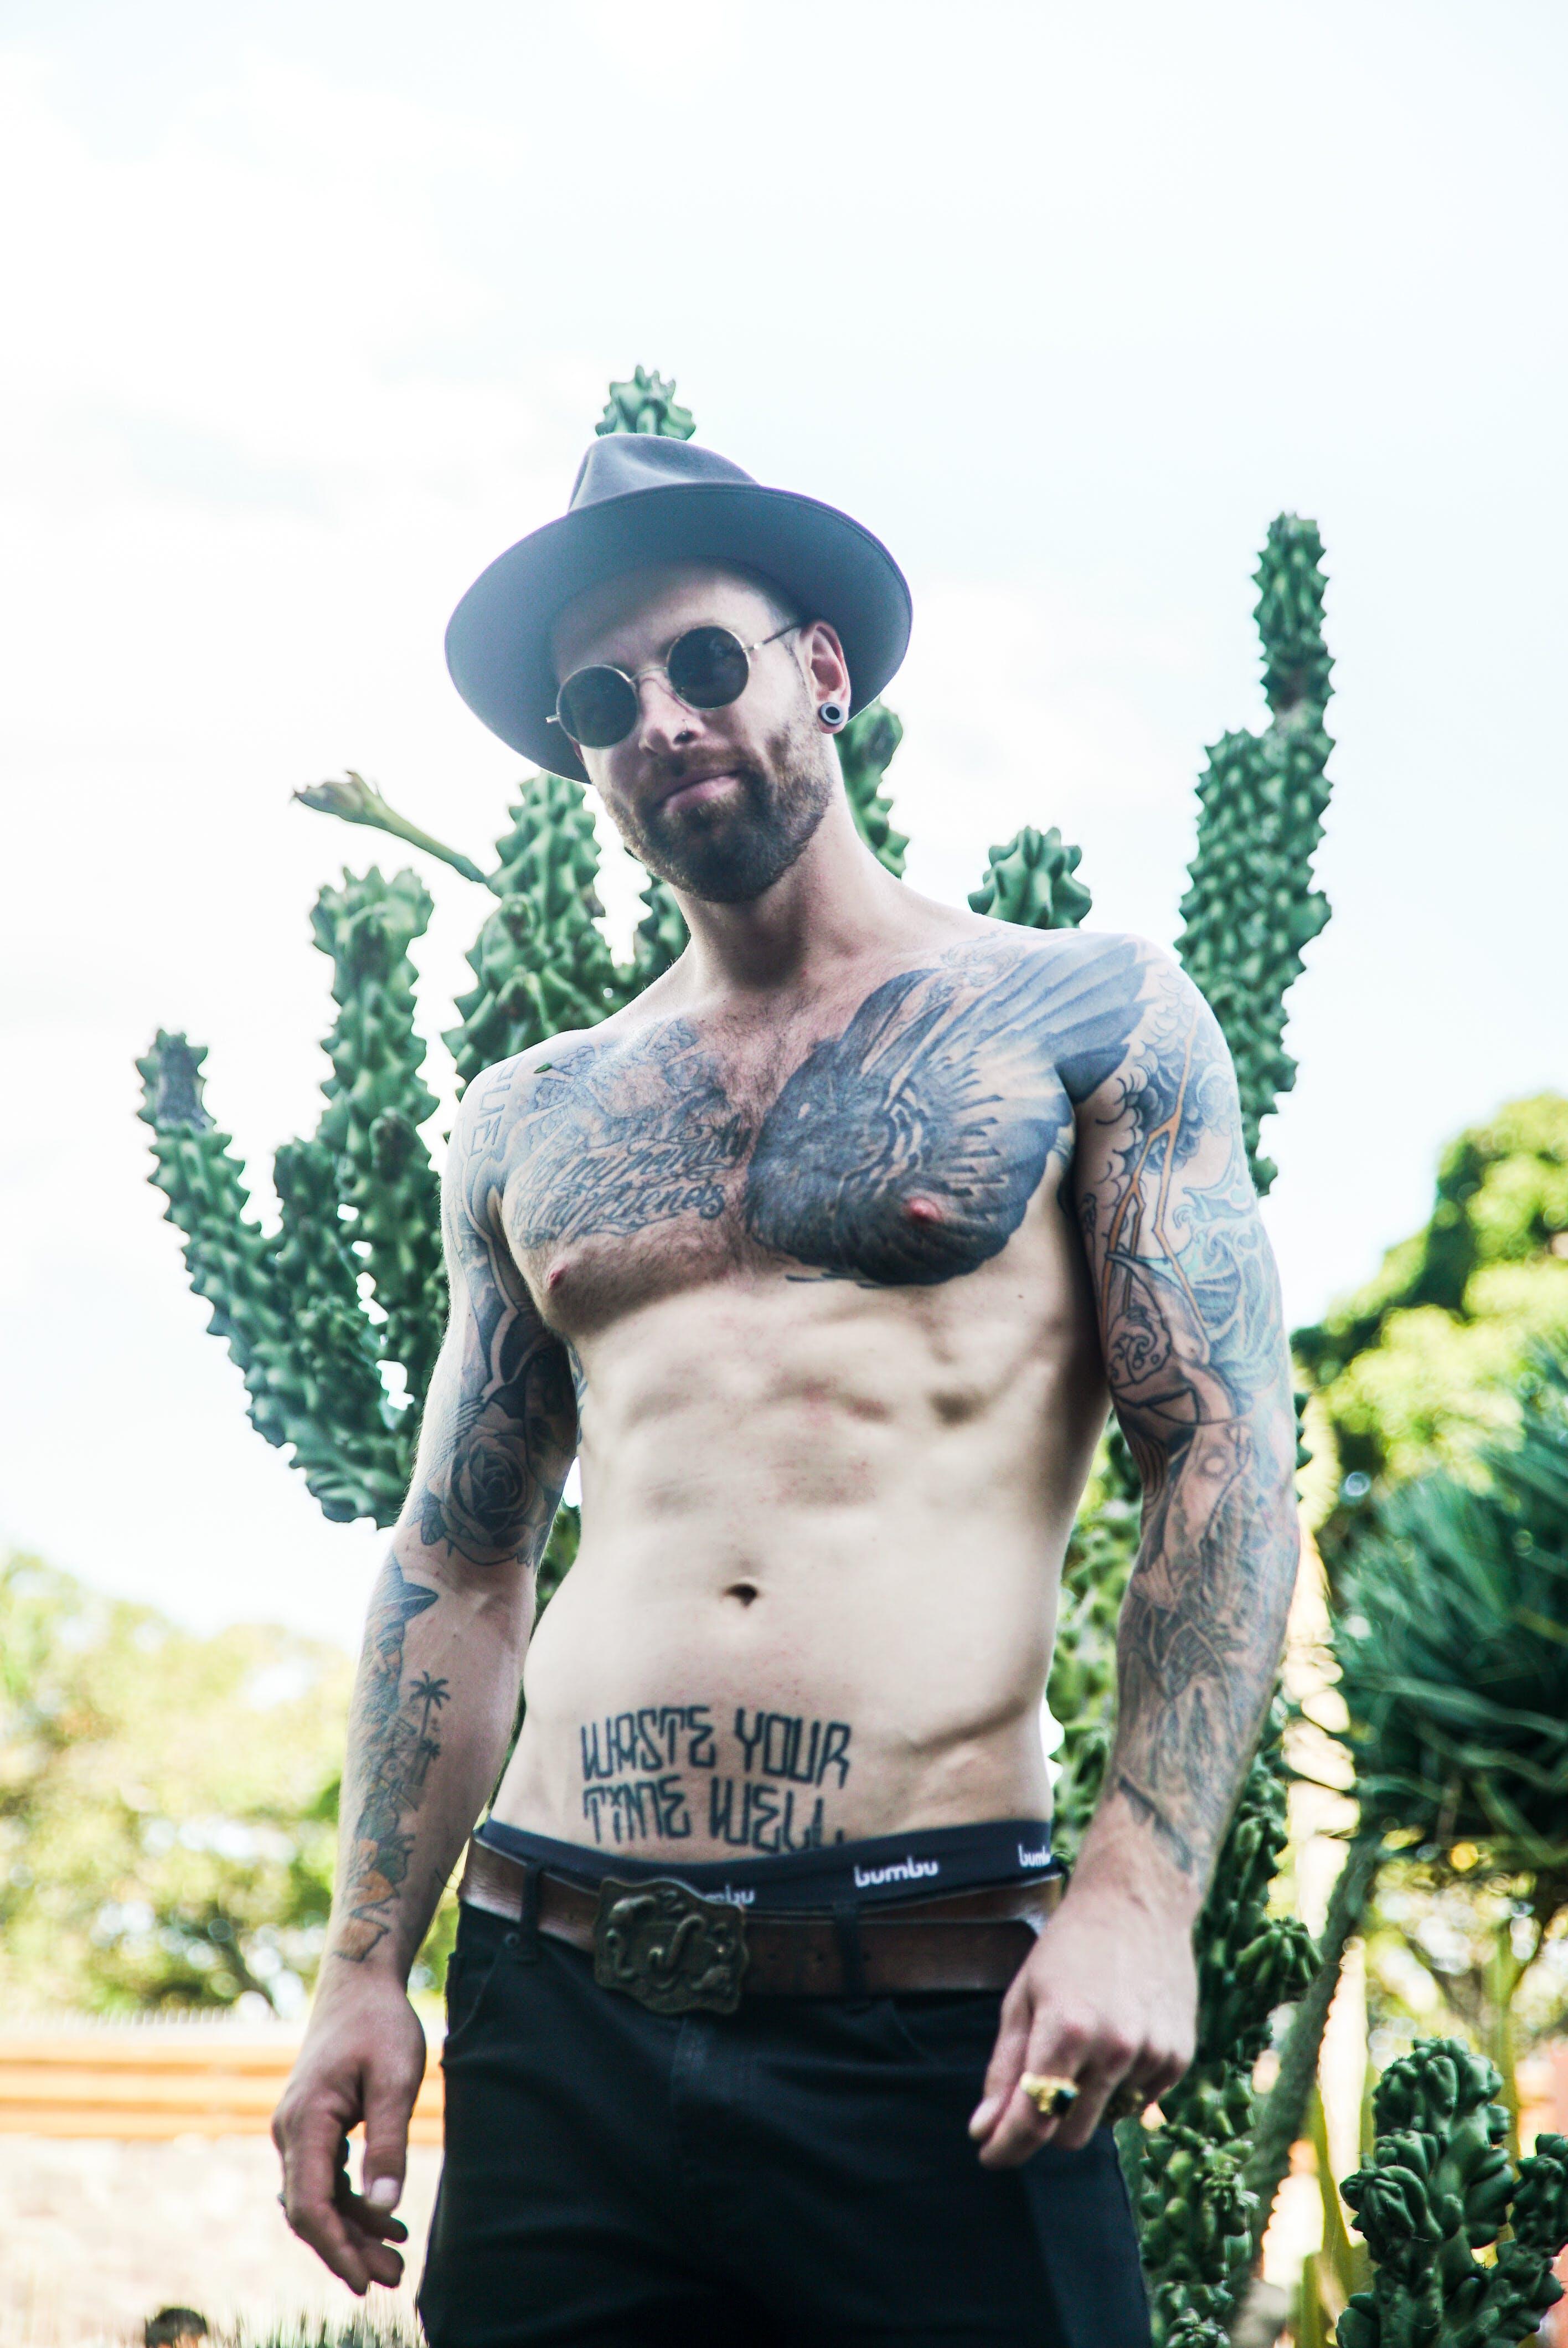 Man Wearing Sunglasses Standing Near Plant